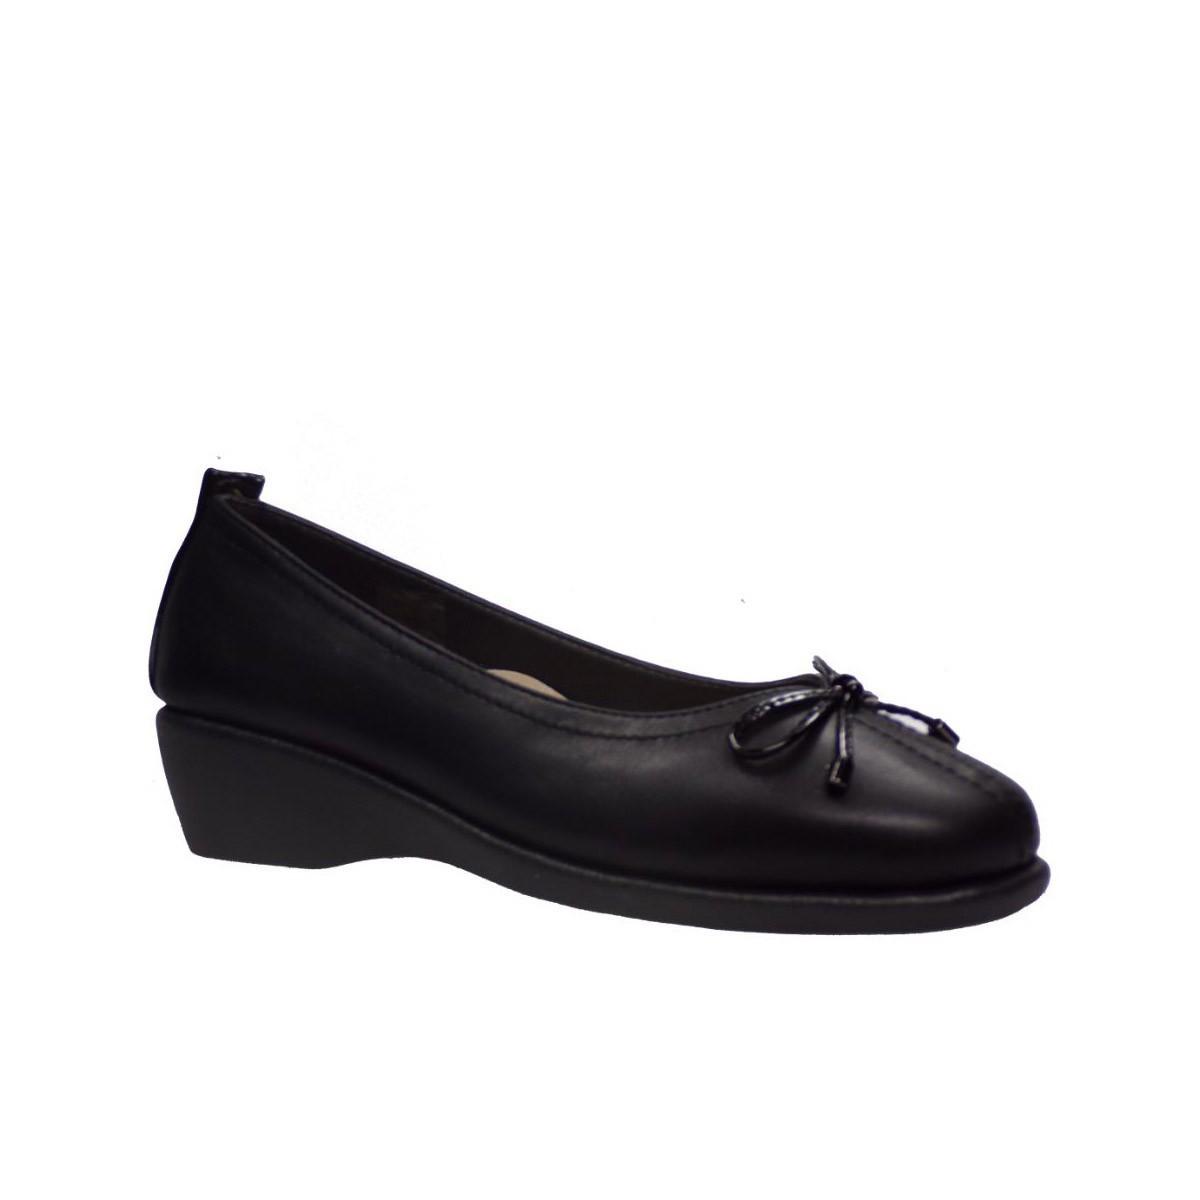 Parex Γυναικεία Παπούτσια QH16924 Μαύρο Parex QH 16924 Μαύρο